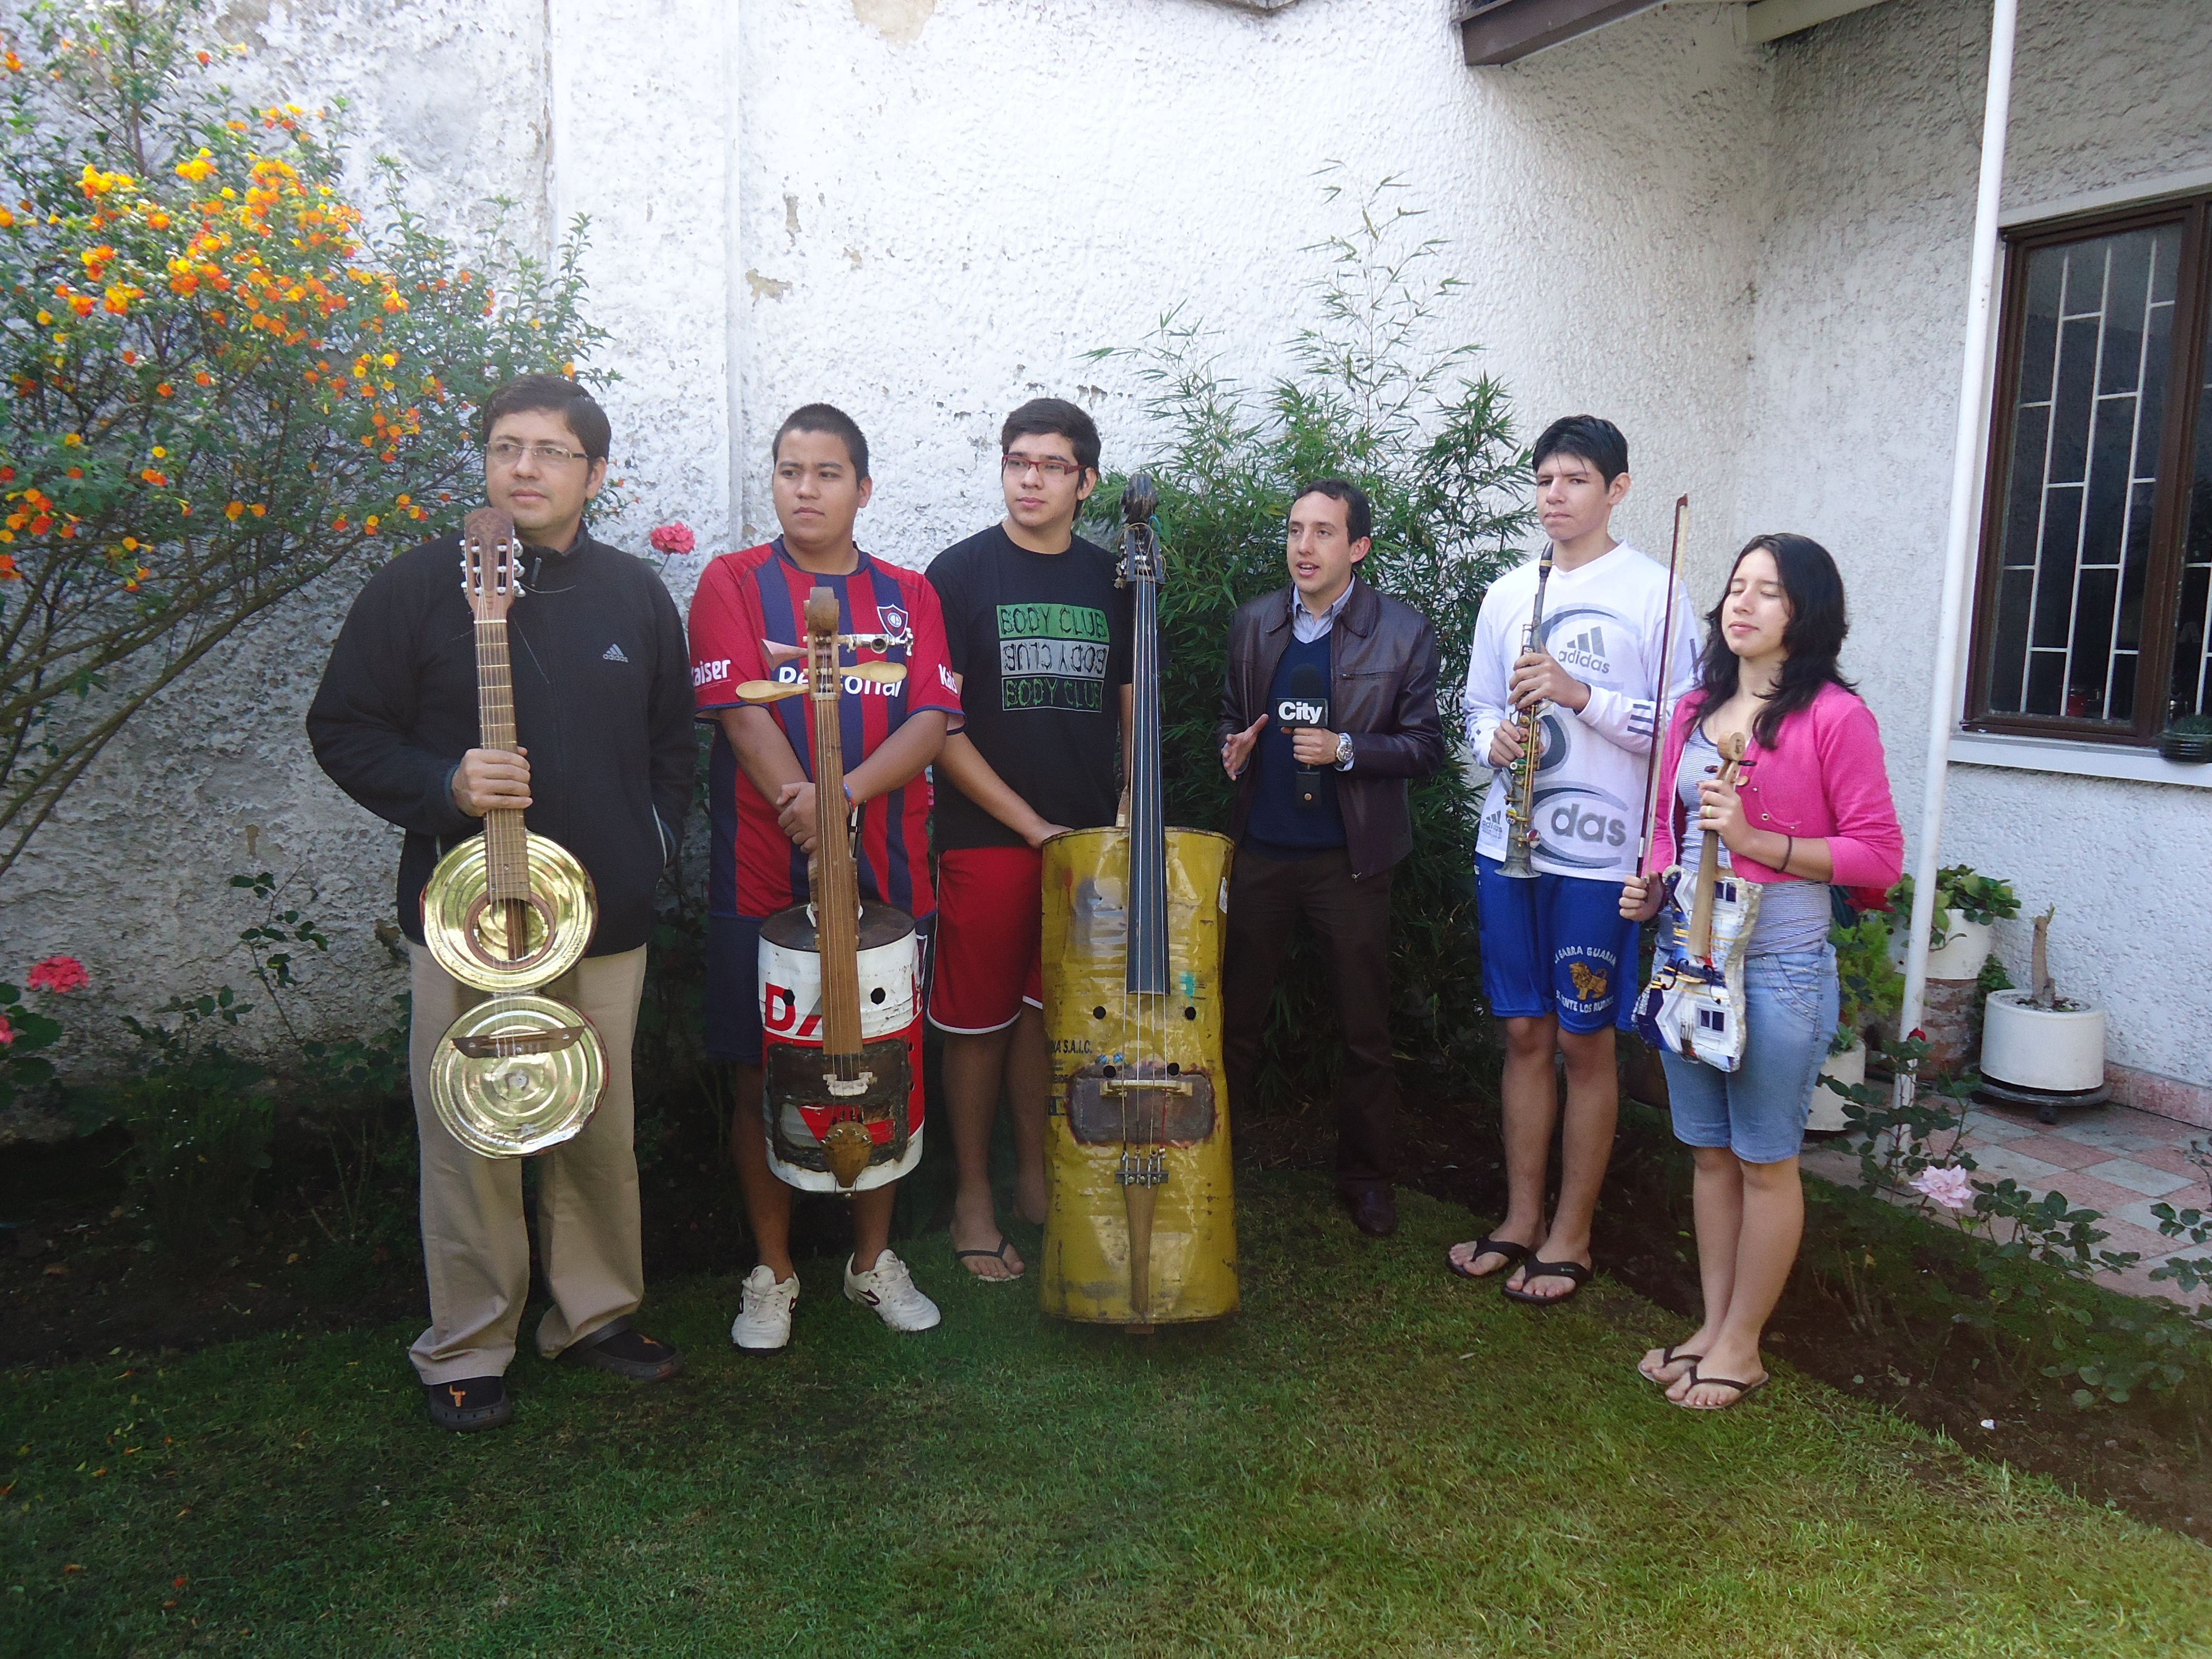 Orquesta de instrumentos reciclados de Cateura, Paraguay